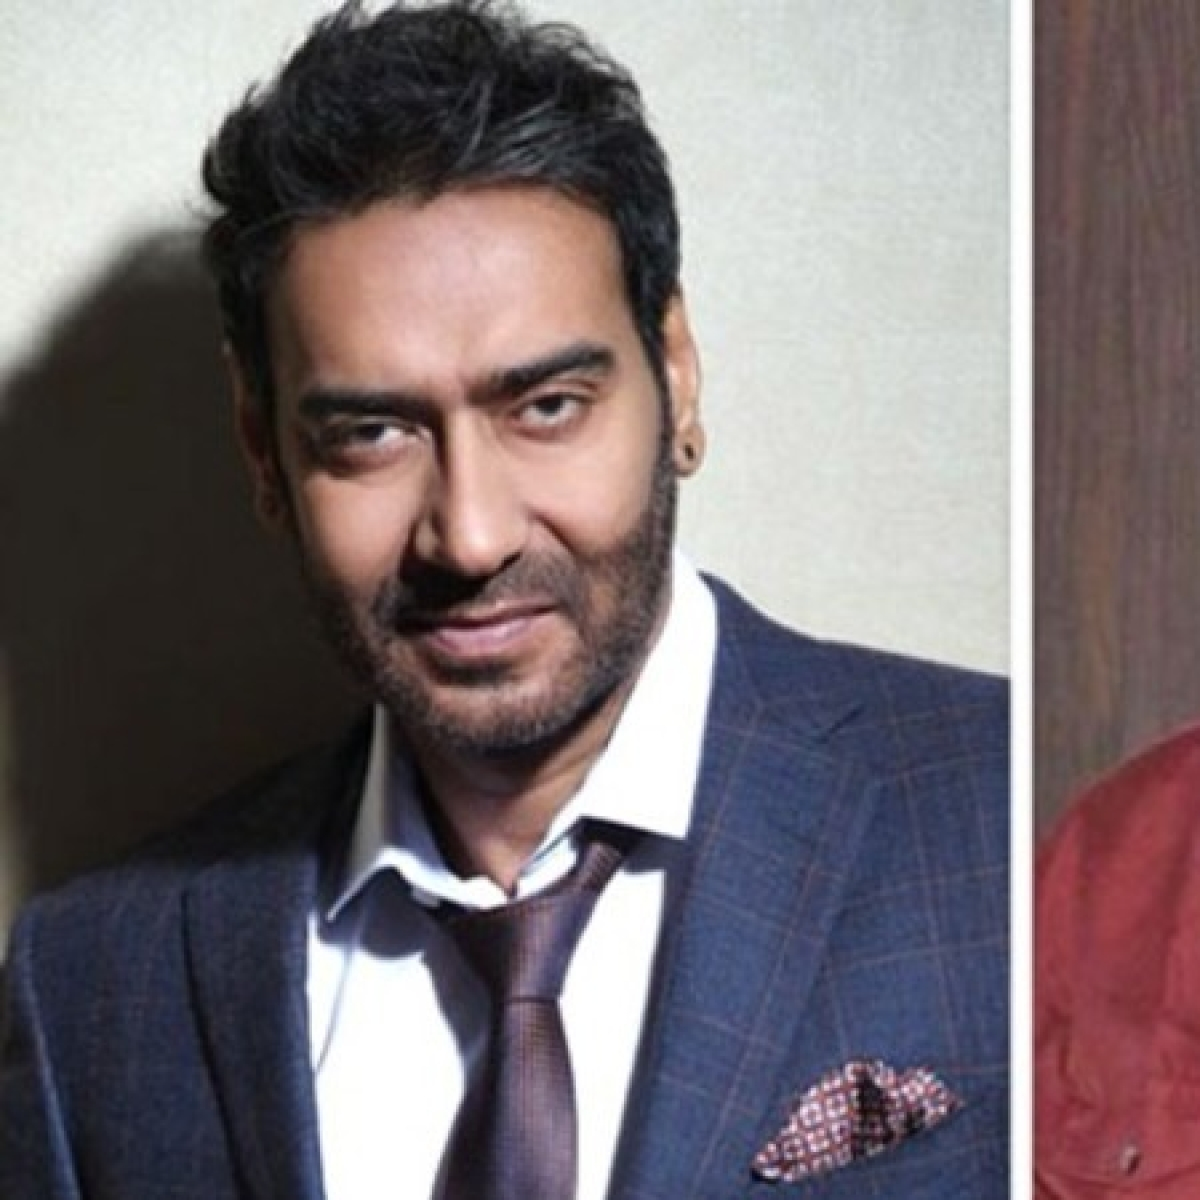 Ajay Devgn roped in for Aanand L Rai's next starring Dhanush and Sara Ali Khan